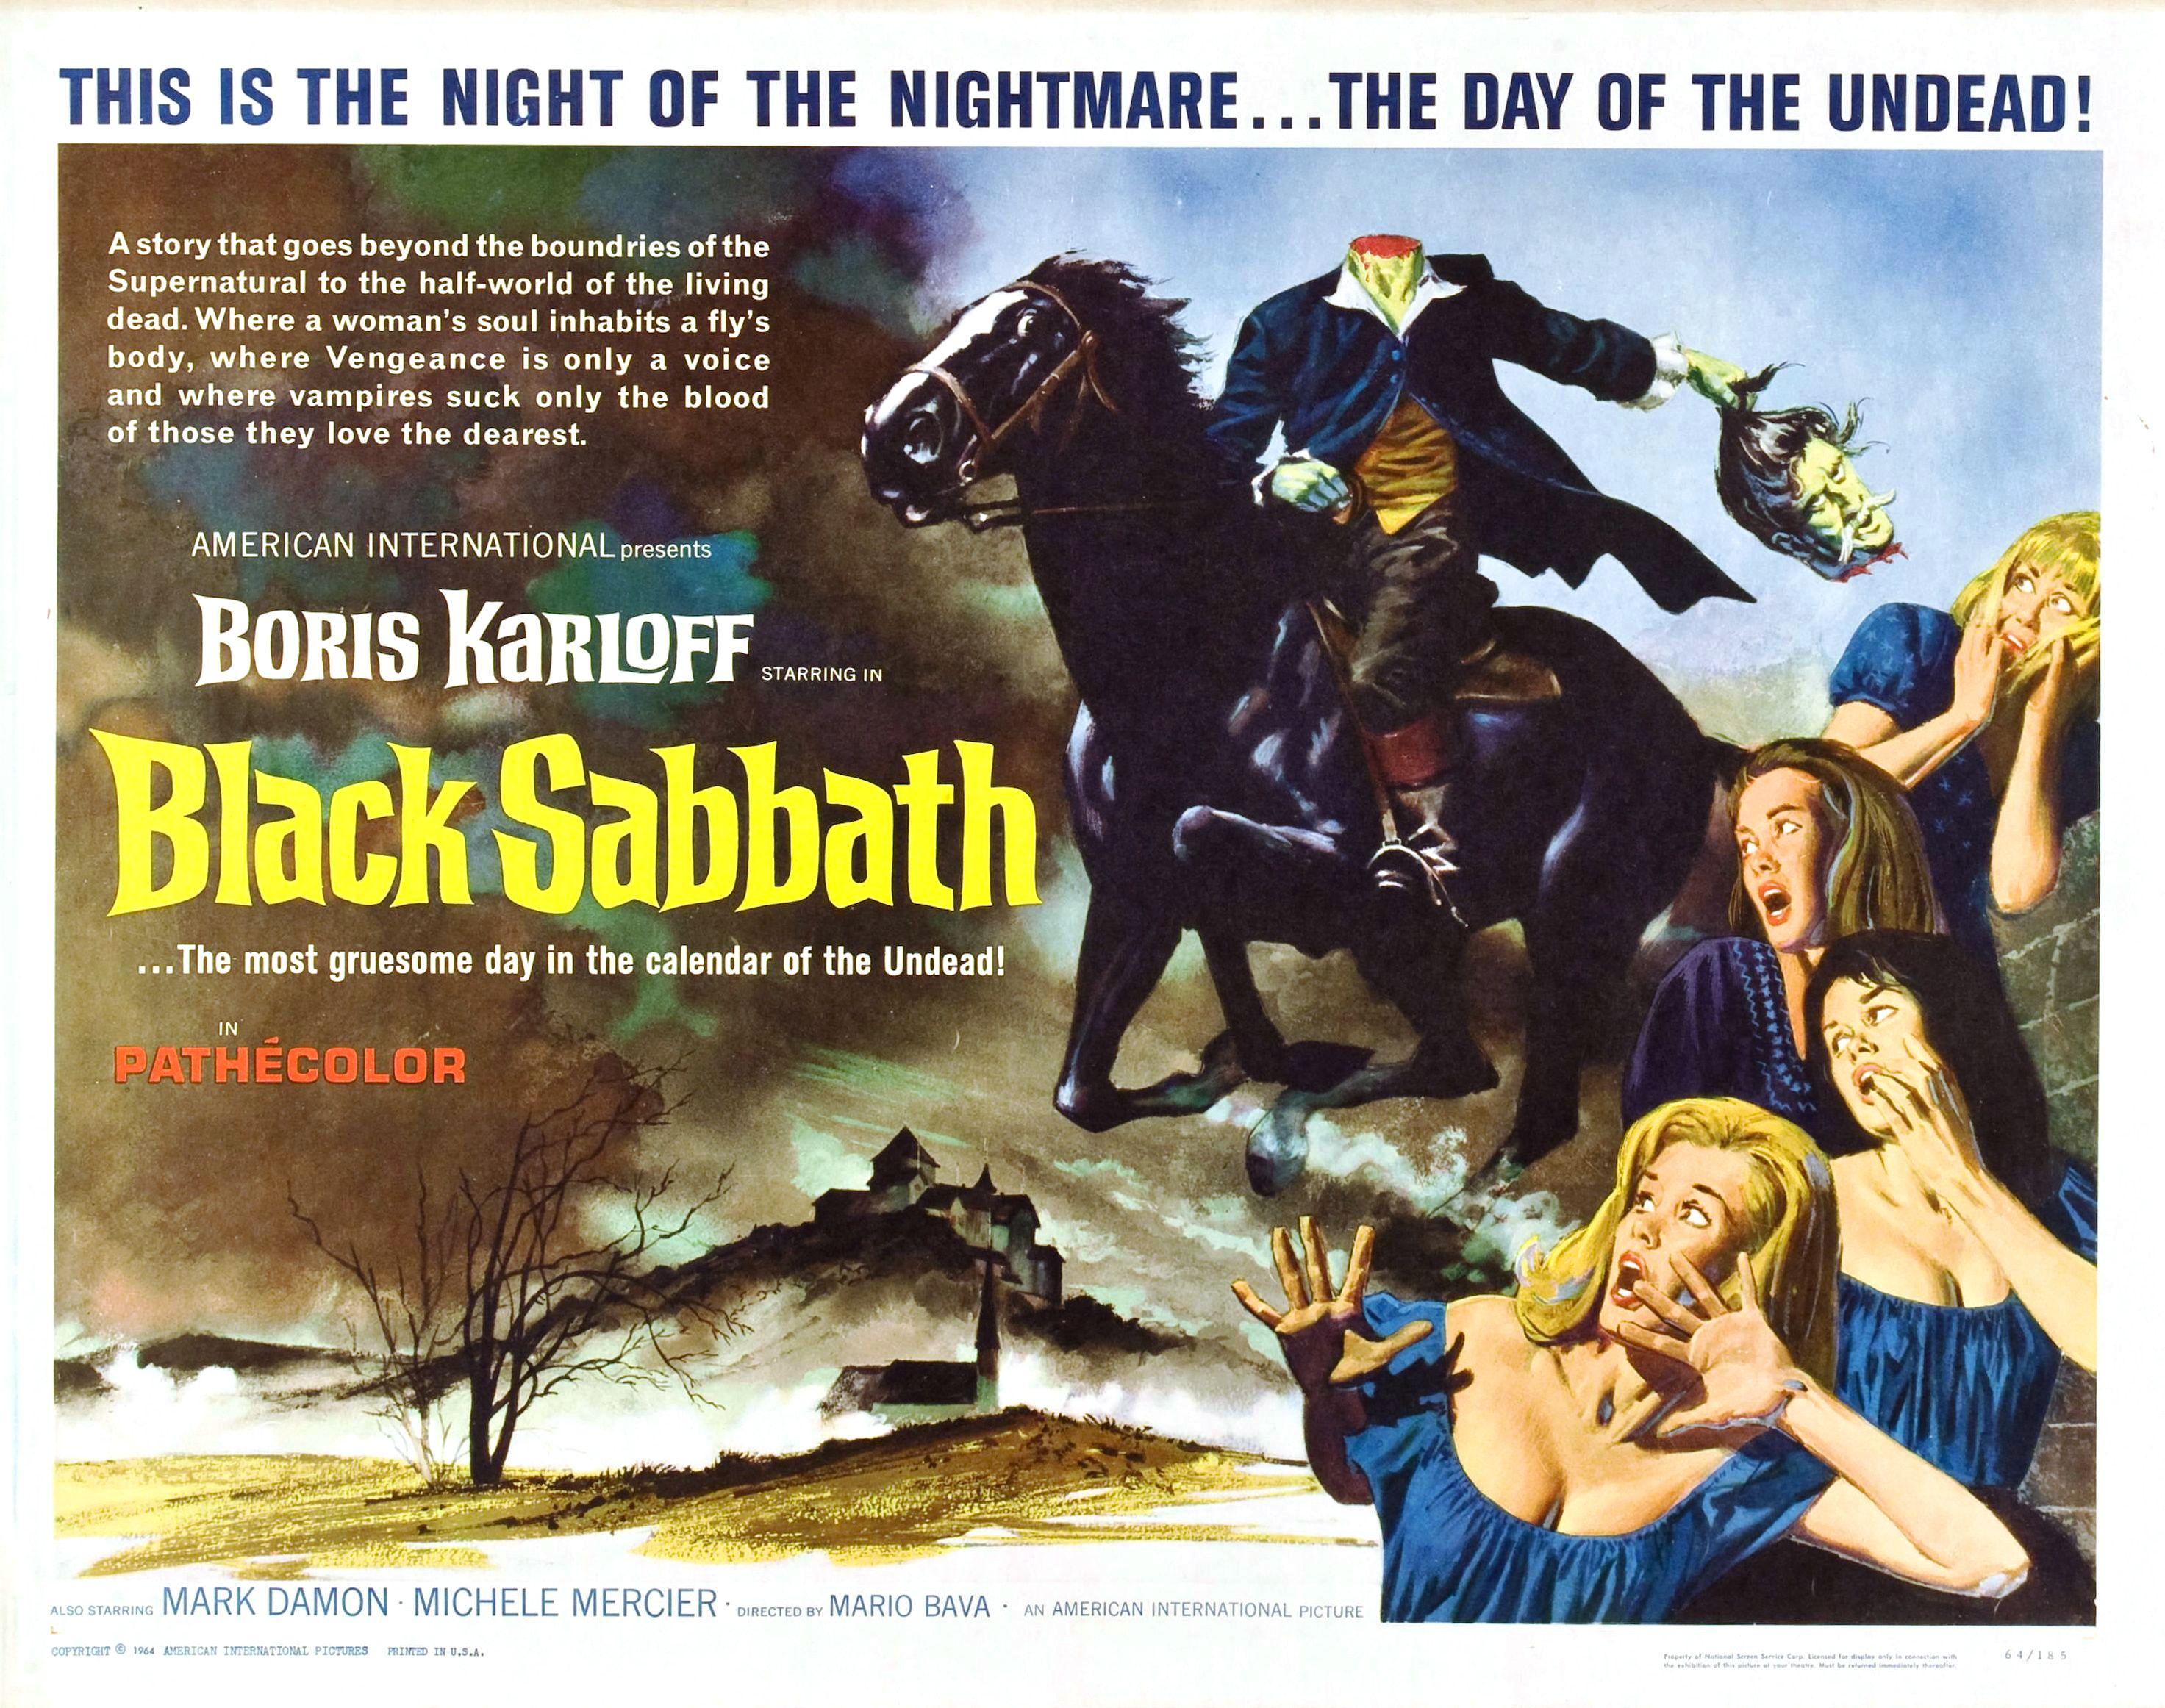 HMM black sabbath 2